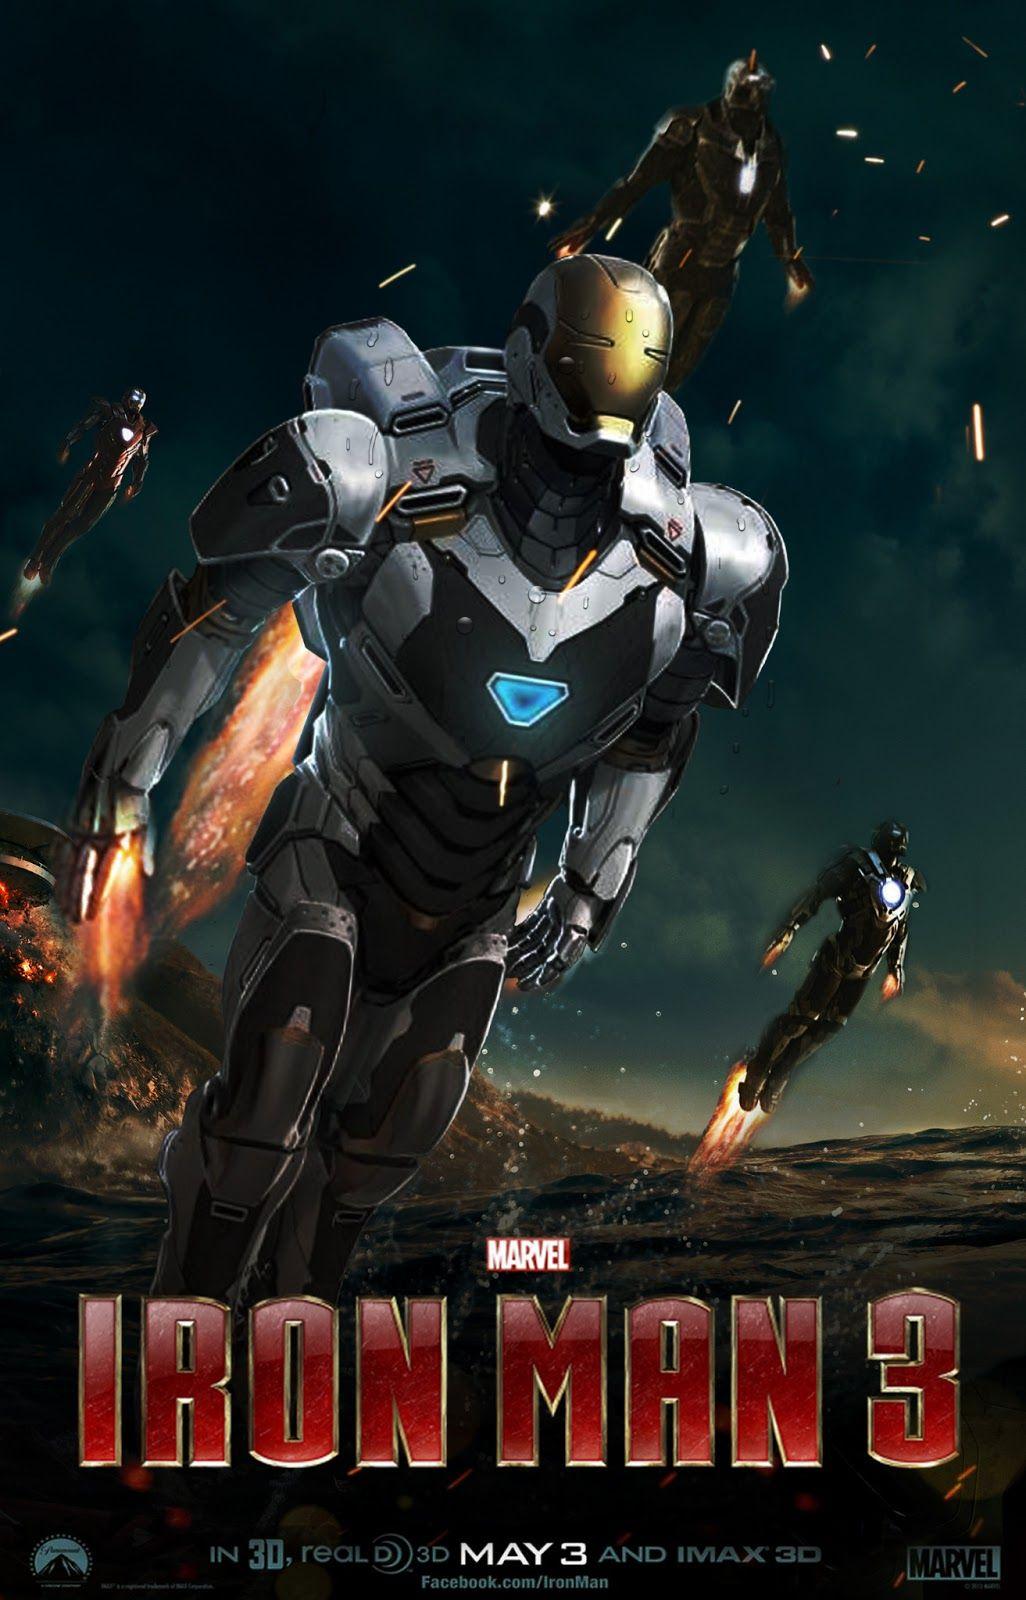 Iron Man 3 The Movie Posters Comic Heroes Art Iron Man 3 Iron Man